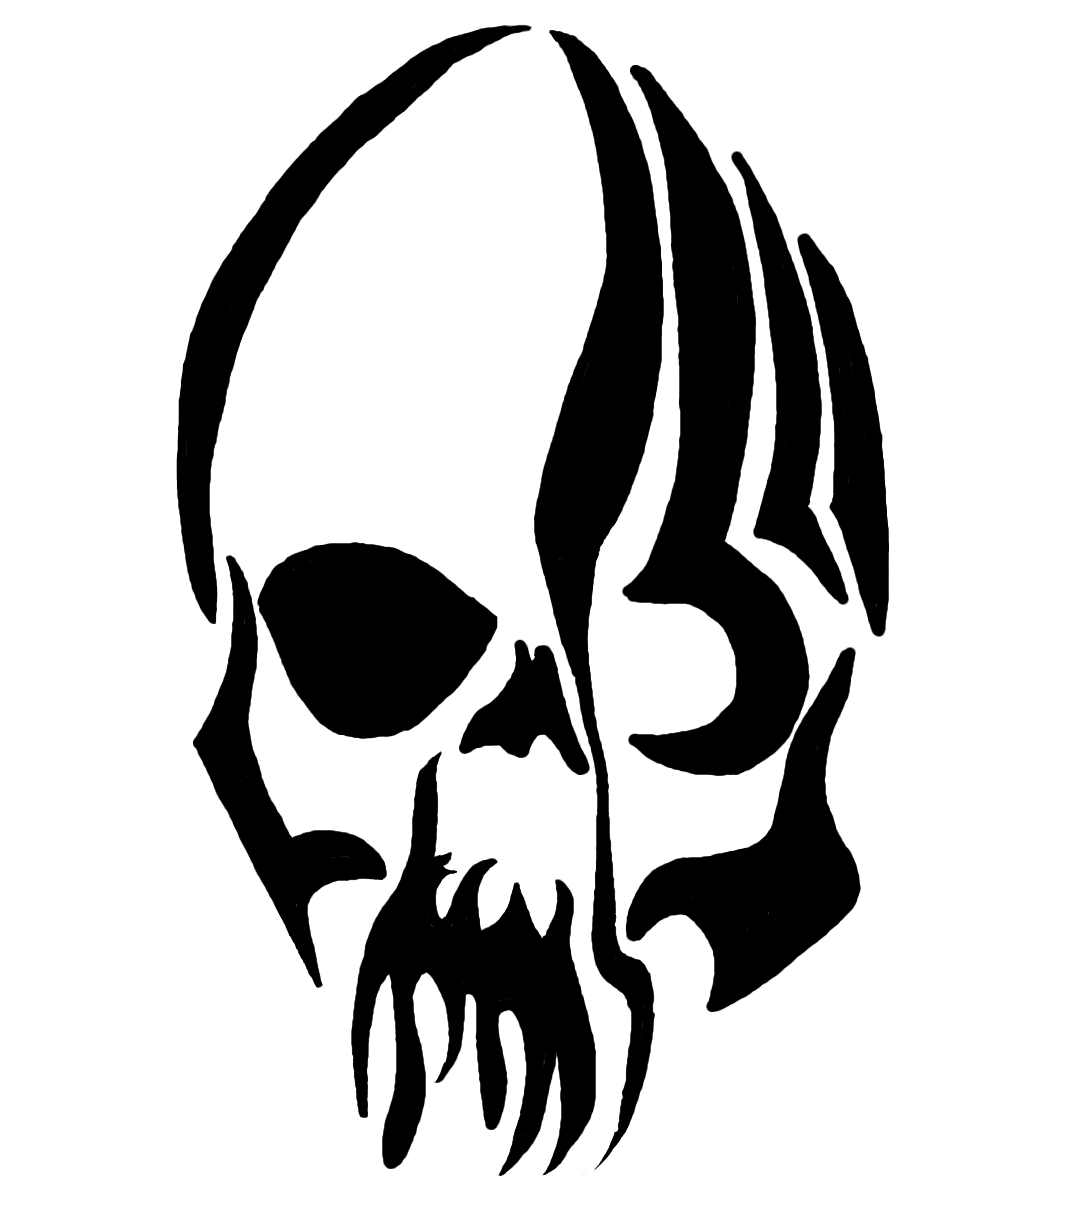 tattoos skull tribal Tattoos Moon  Tattoo Meaning Moon